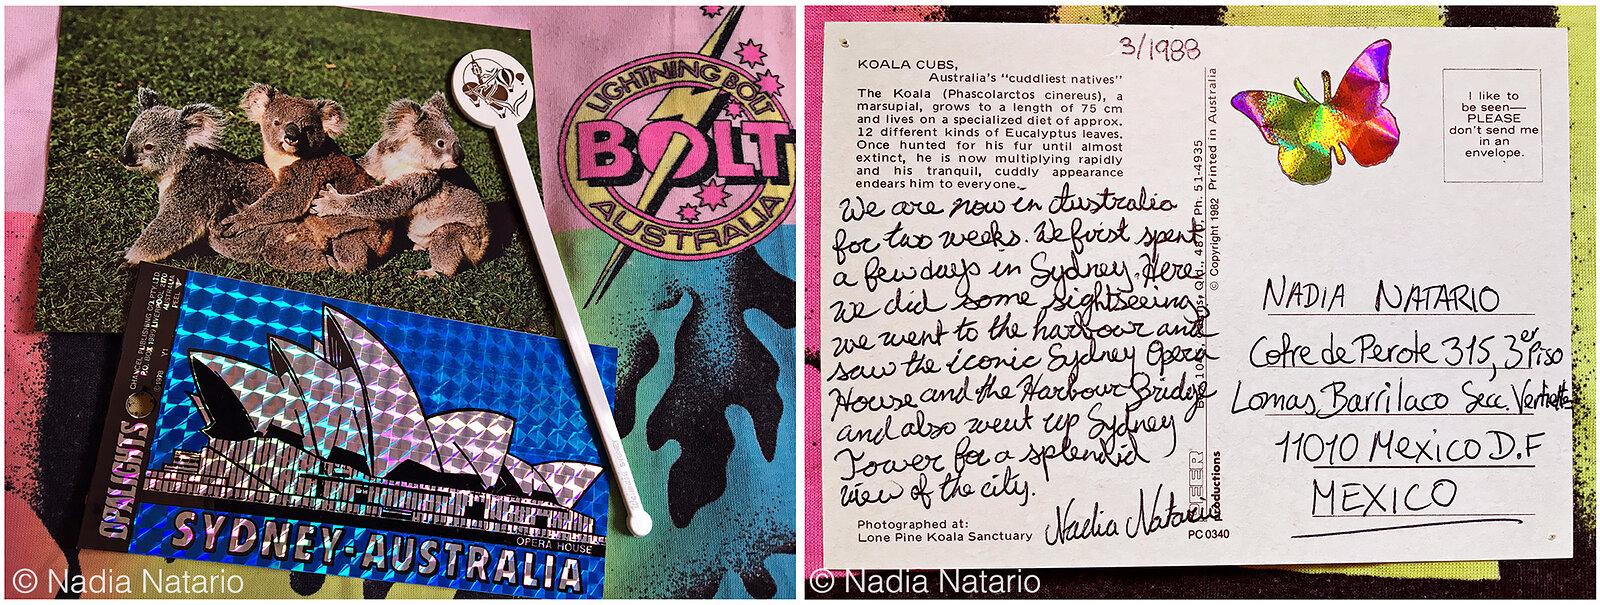 Postcards to Myself - Sydney, Australia, 1988